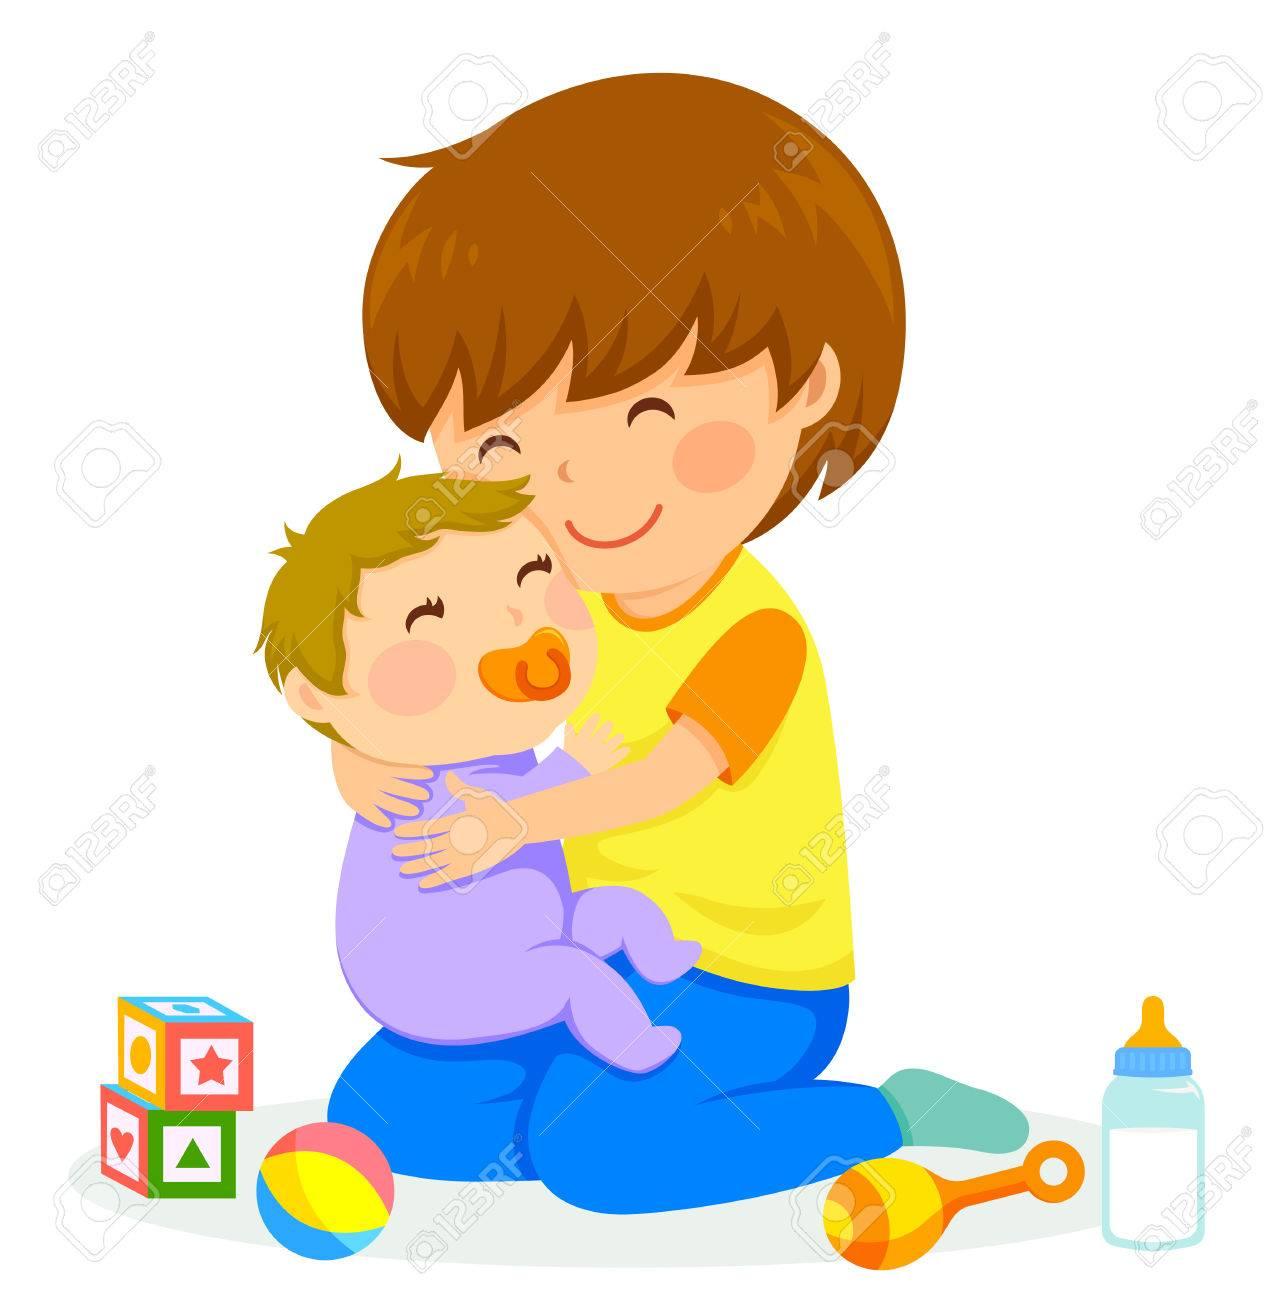 little boy hugging a baby - 83237776